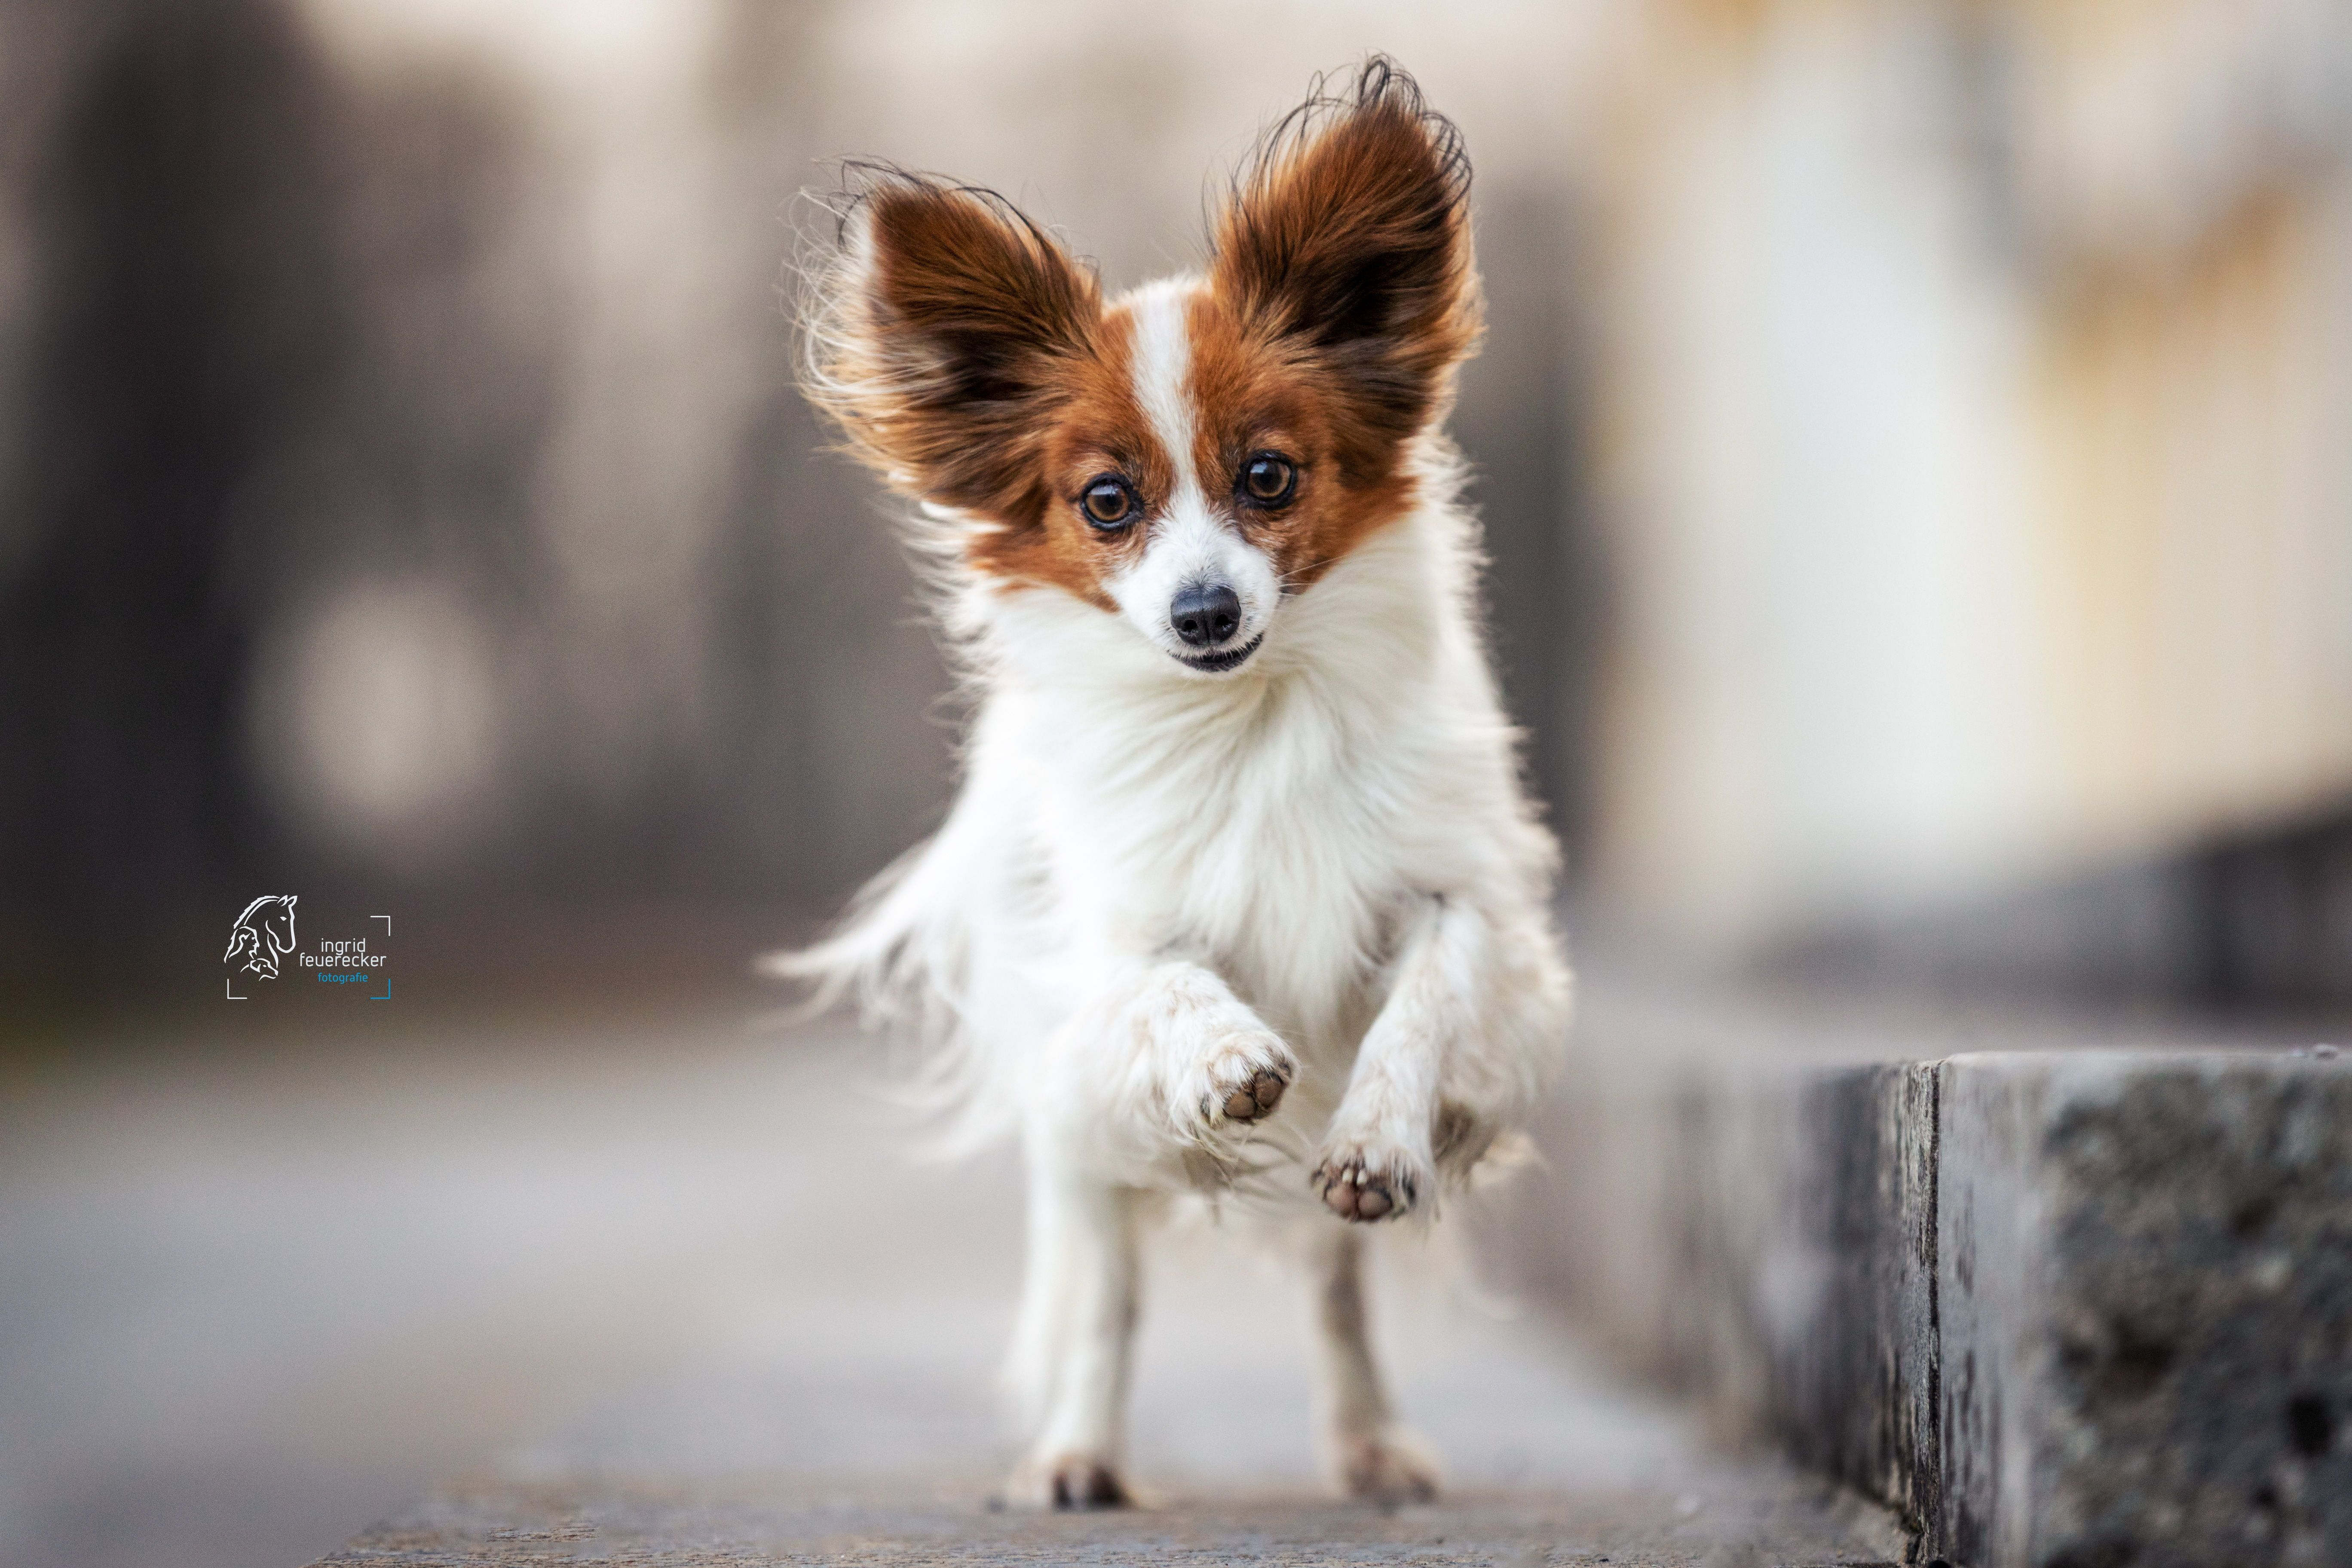 Papillon Chili Vollgas In 2020 Hundefotografie Tierfotografie Hund Portraits